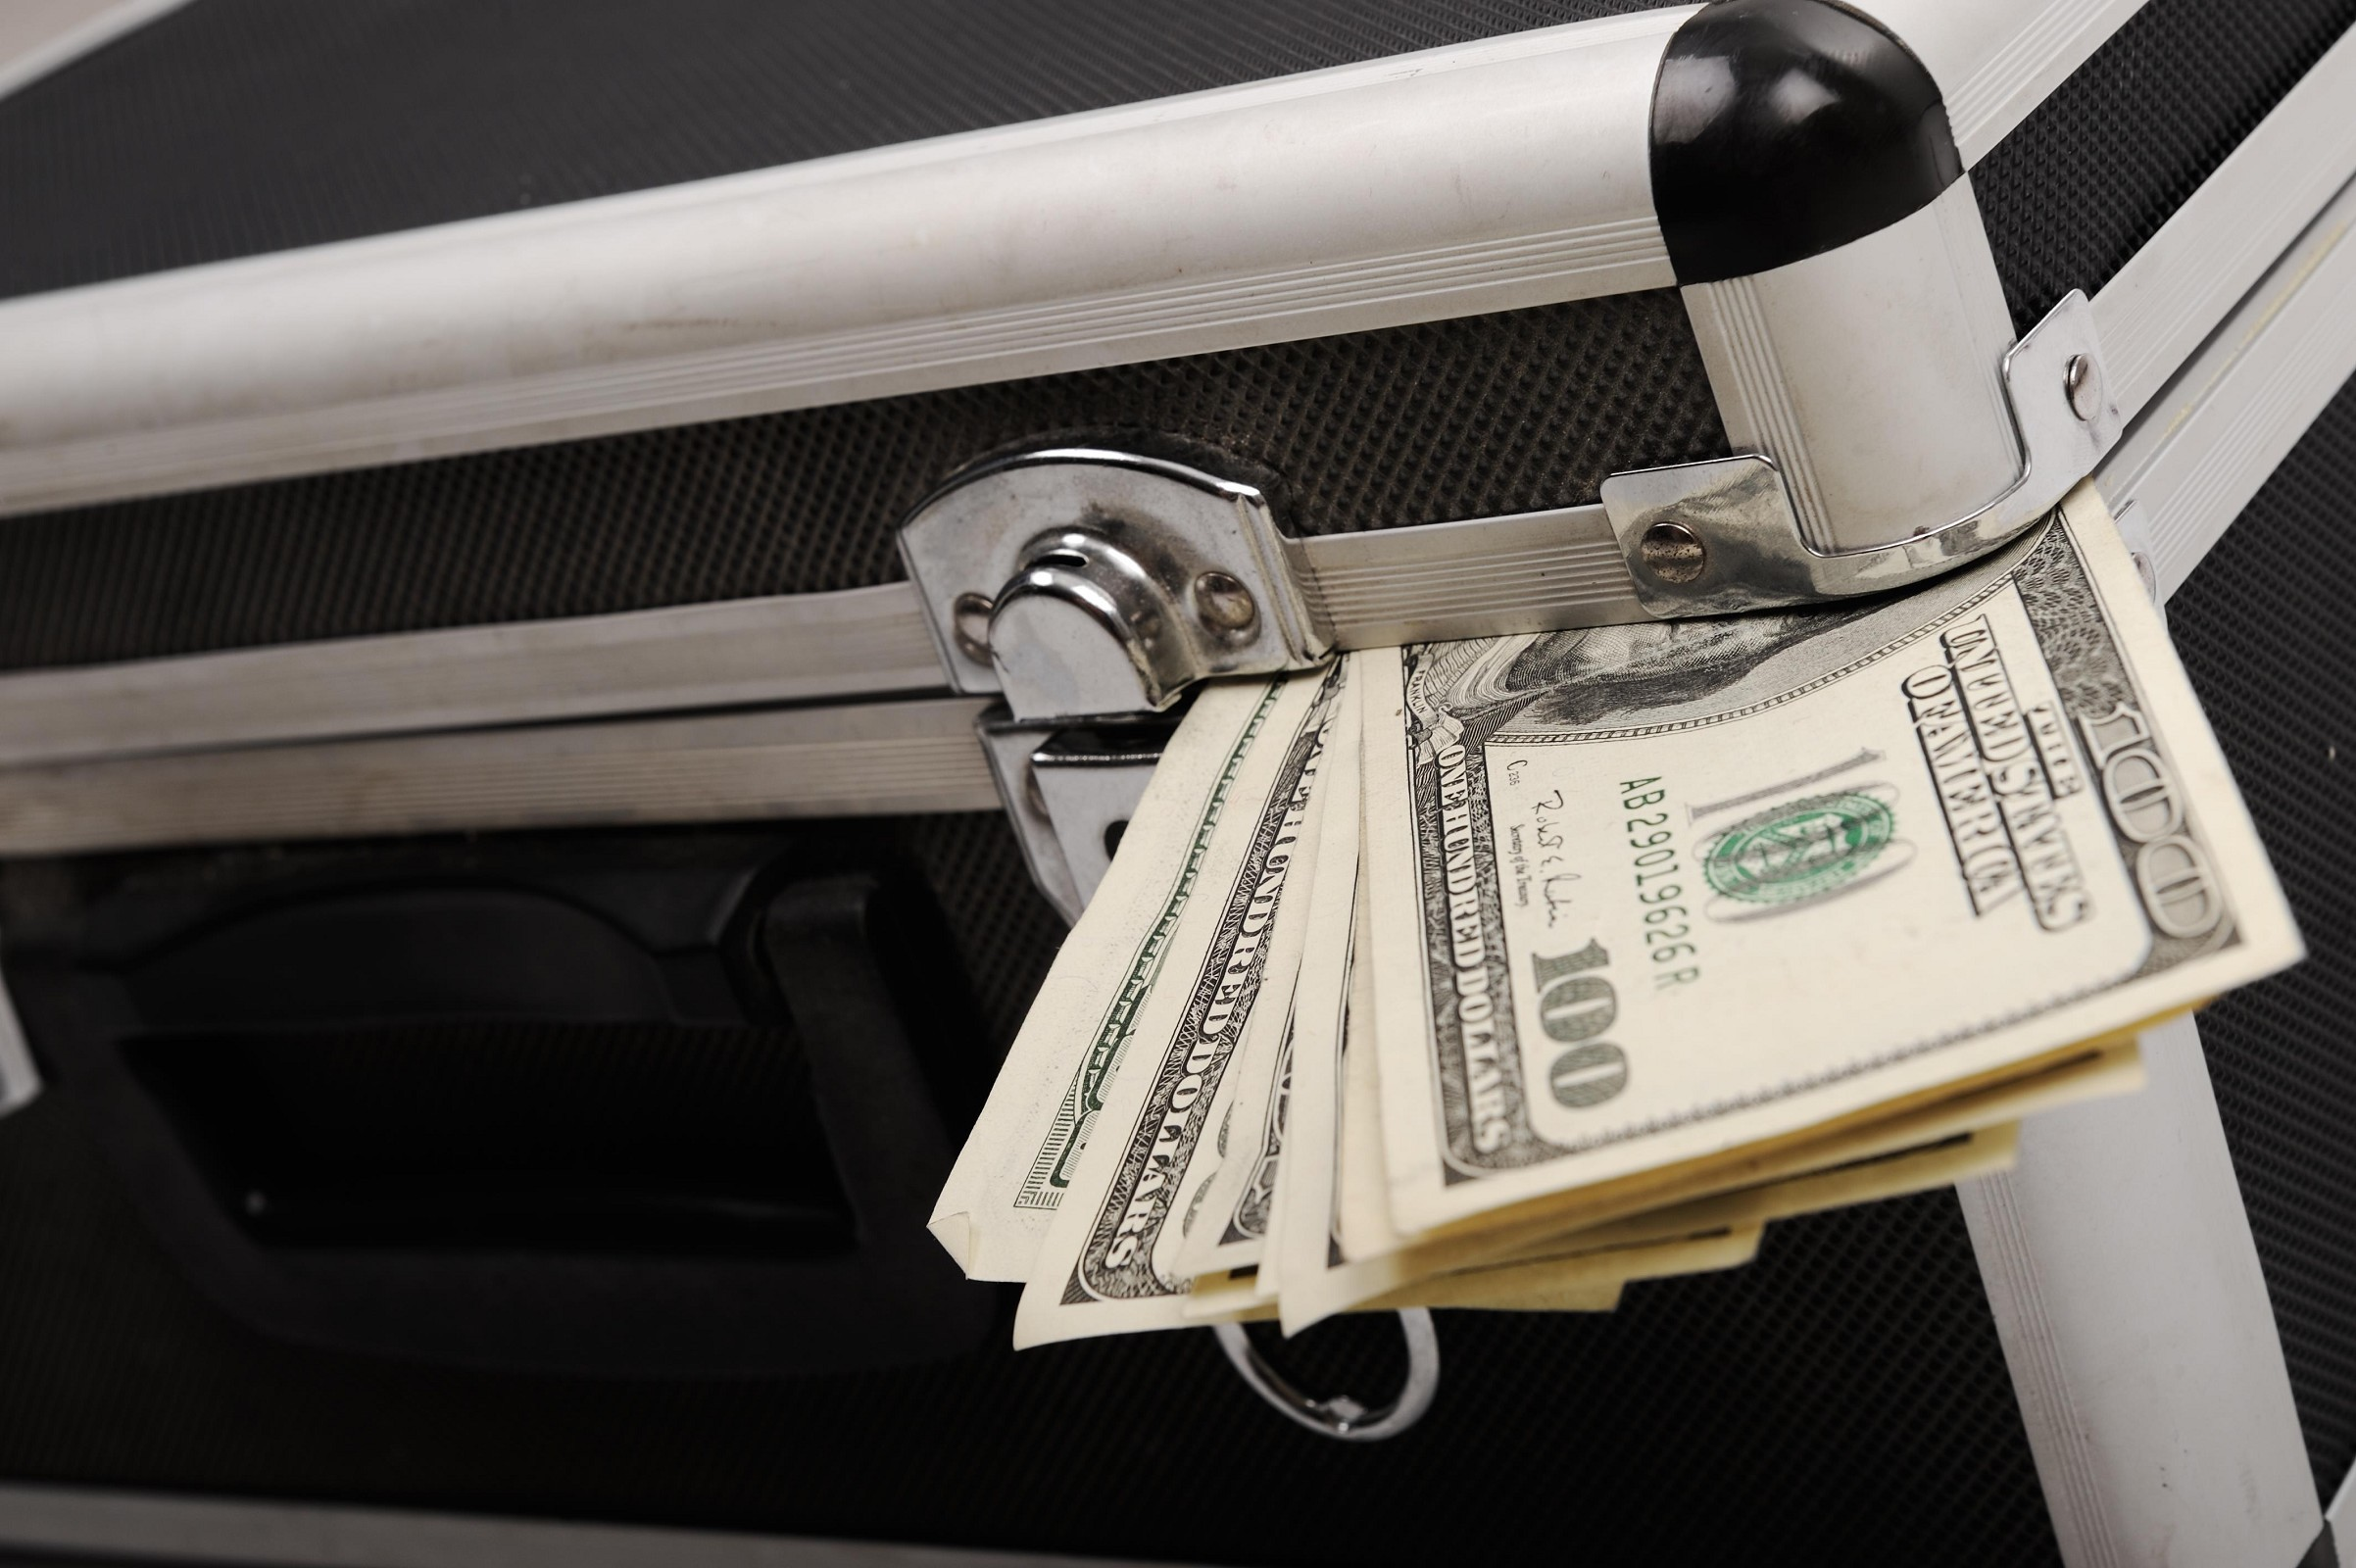 FBL Small Business Lending Dallas TX | 469-893-1609